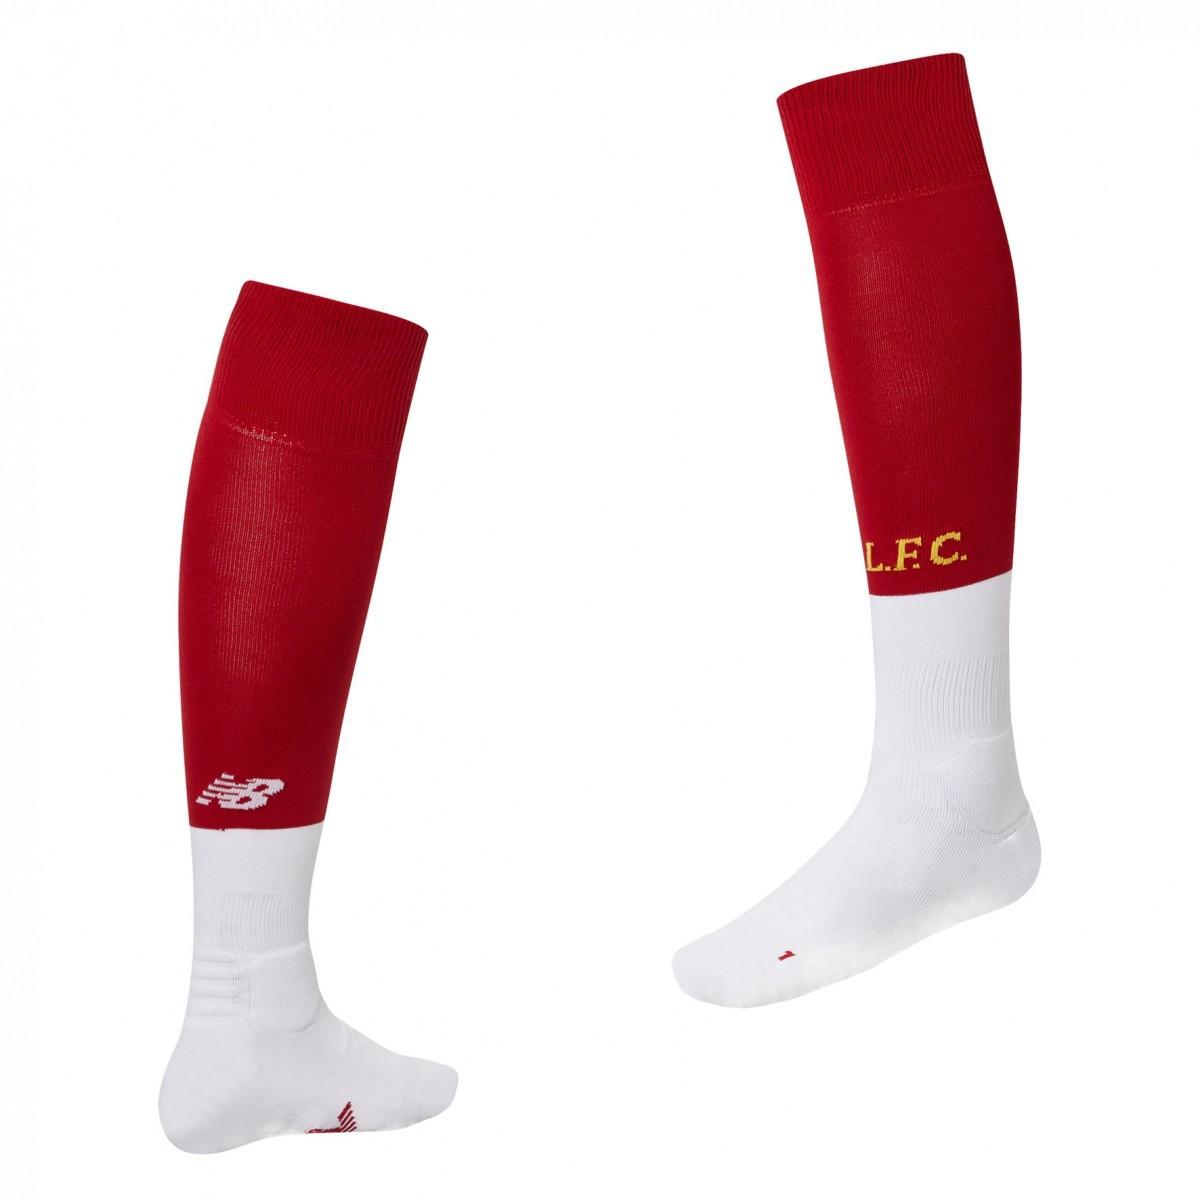 Liverpool home socks - boys